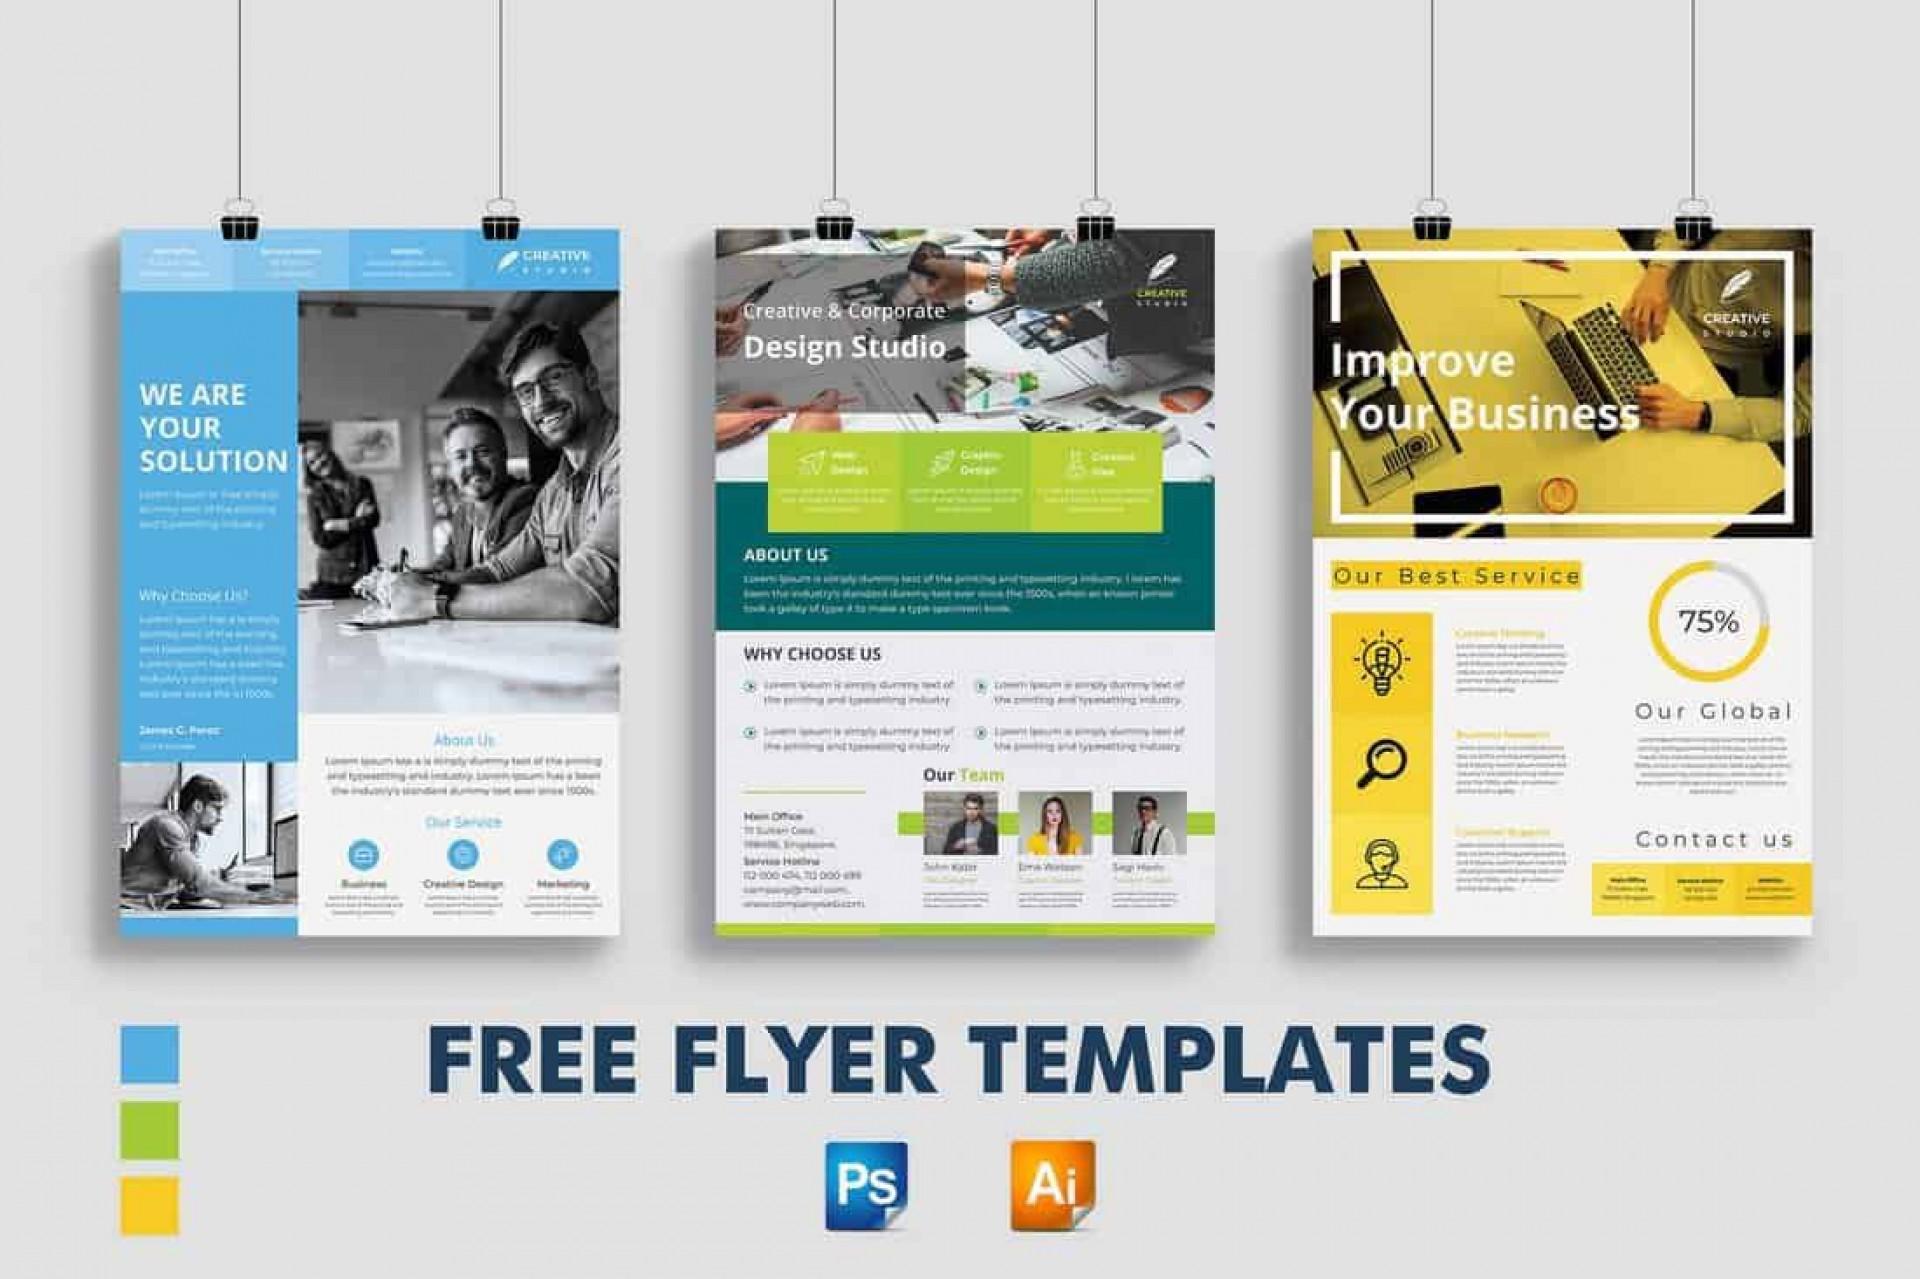 009 Wondrou Free Flyer Design Template Highest Clarity  Templates Online Download Psd1920